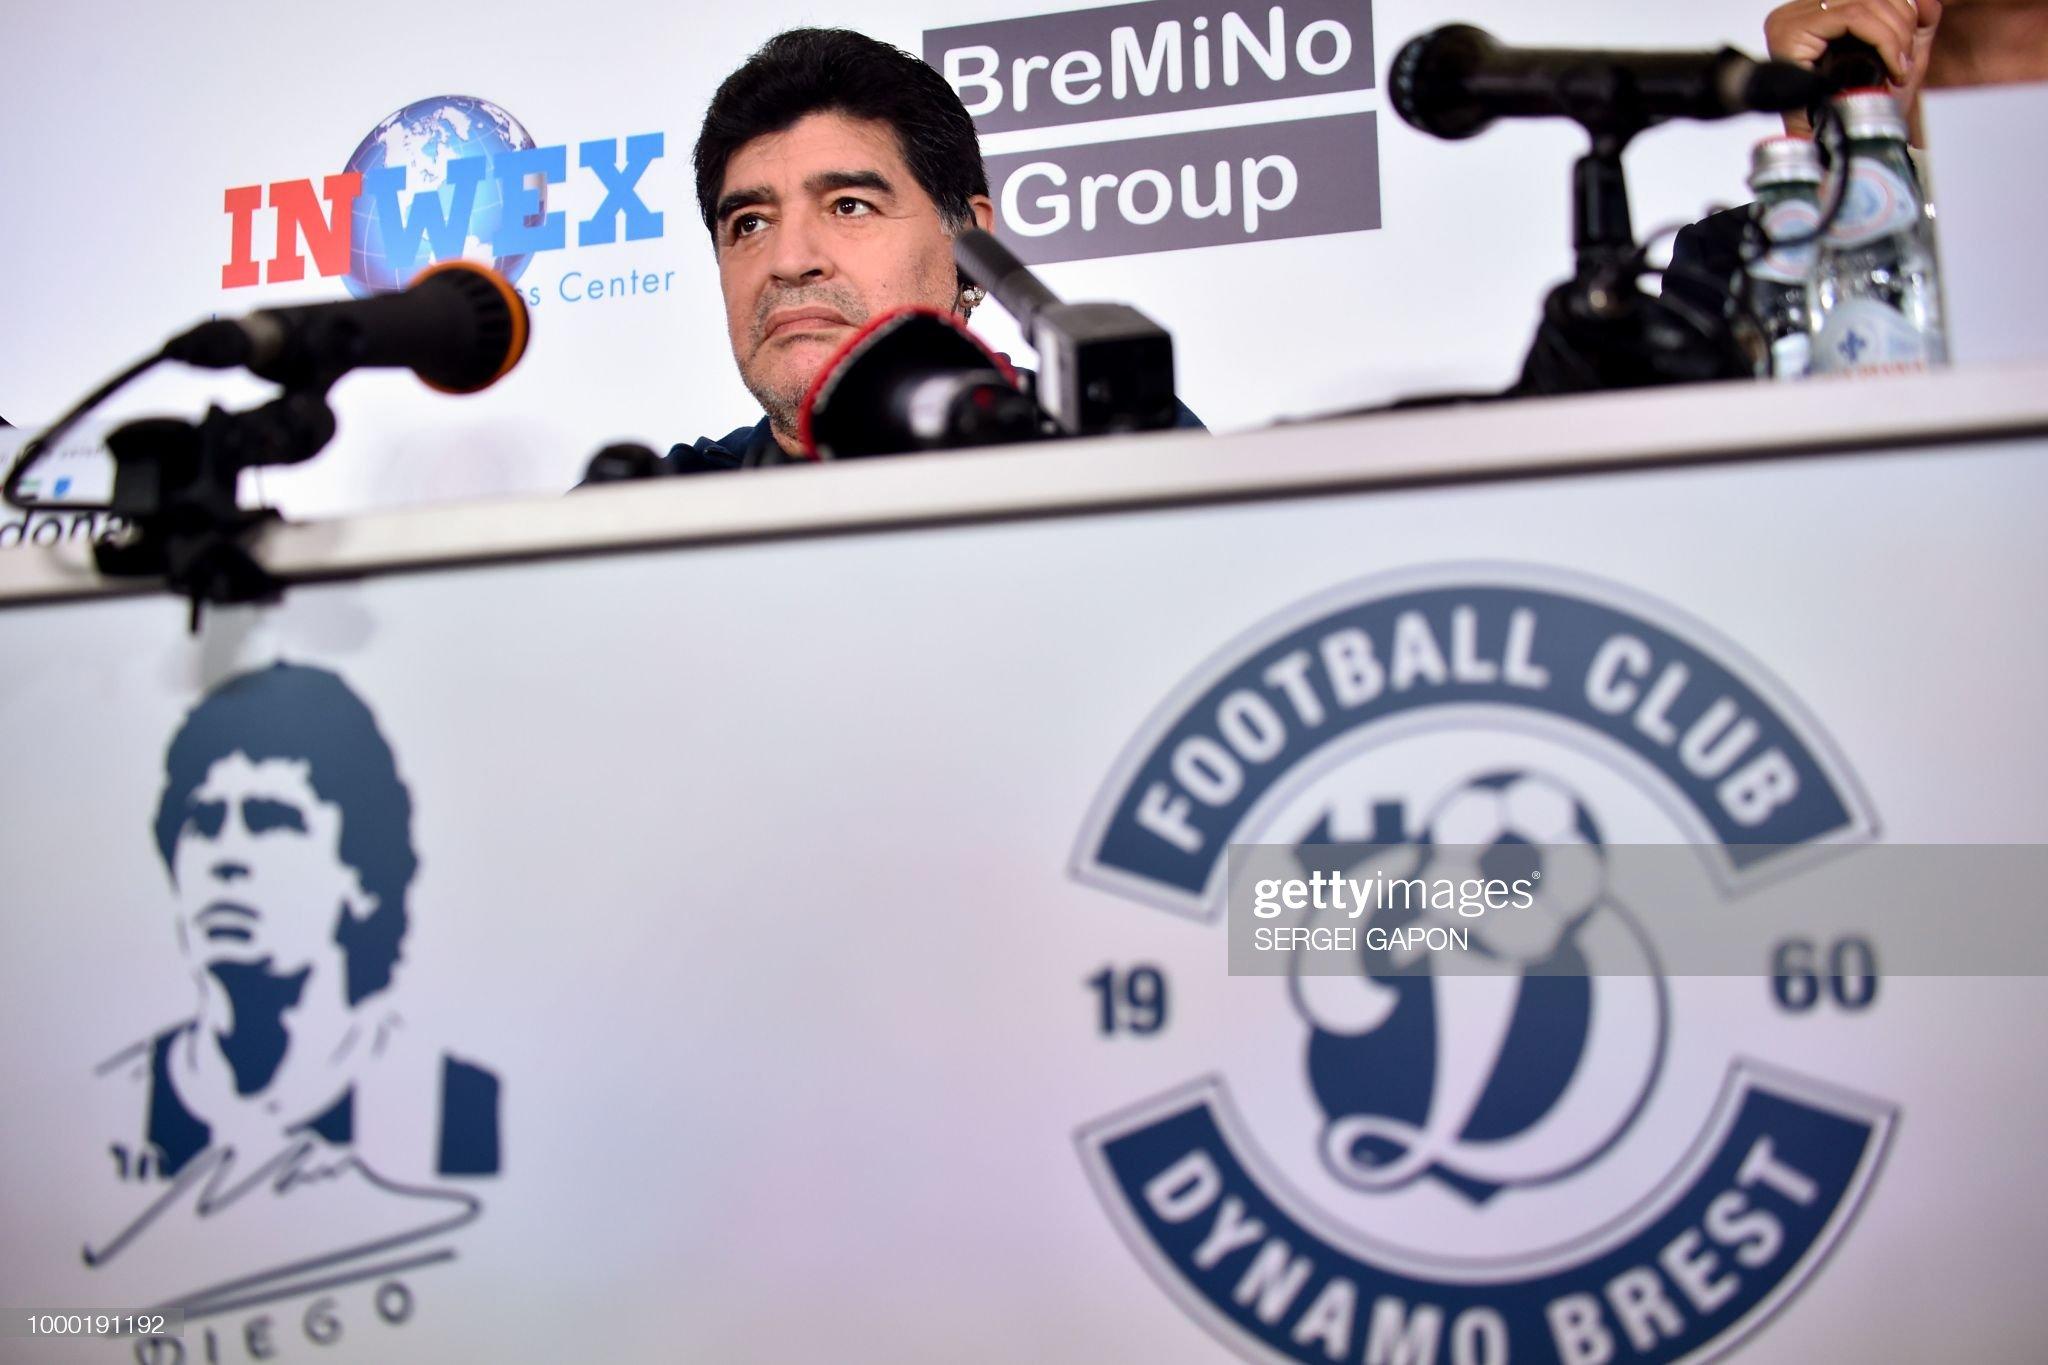 Dinamo Brest v Slavia Mozyr Preview, prediction and odds